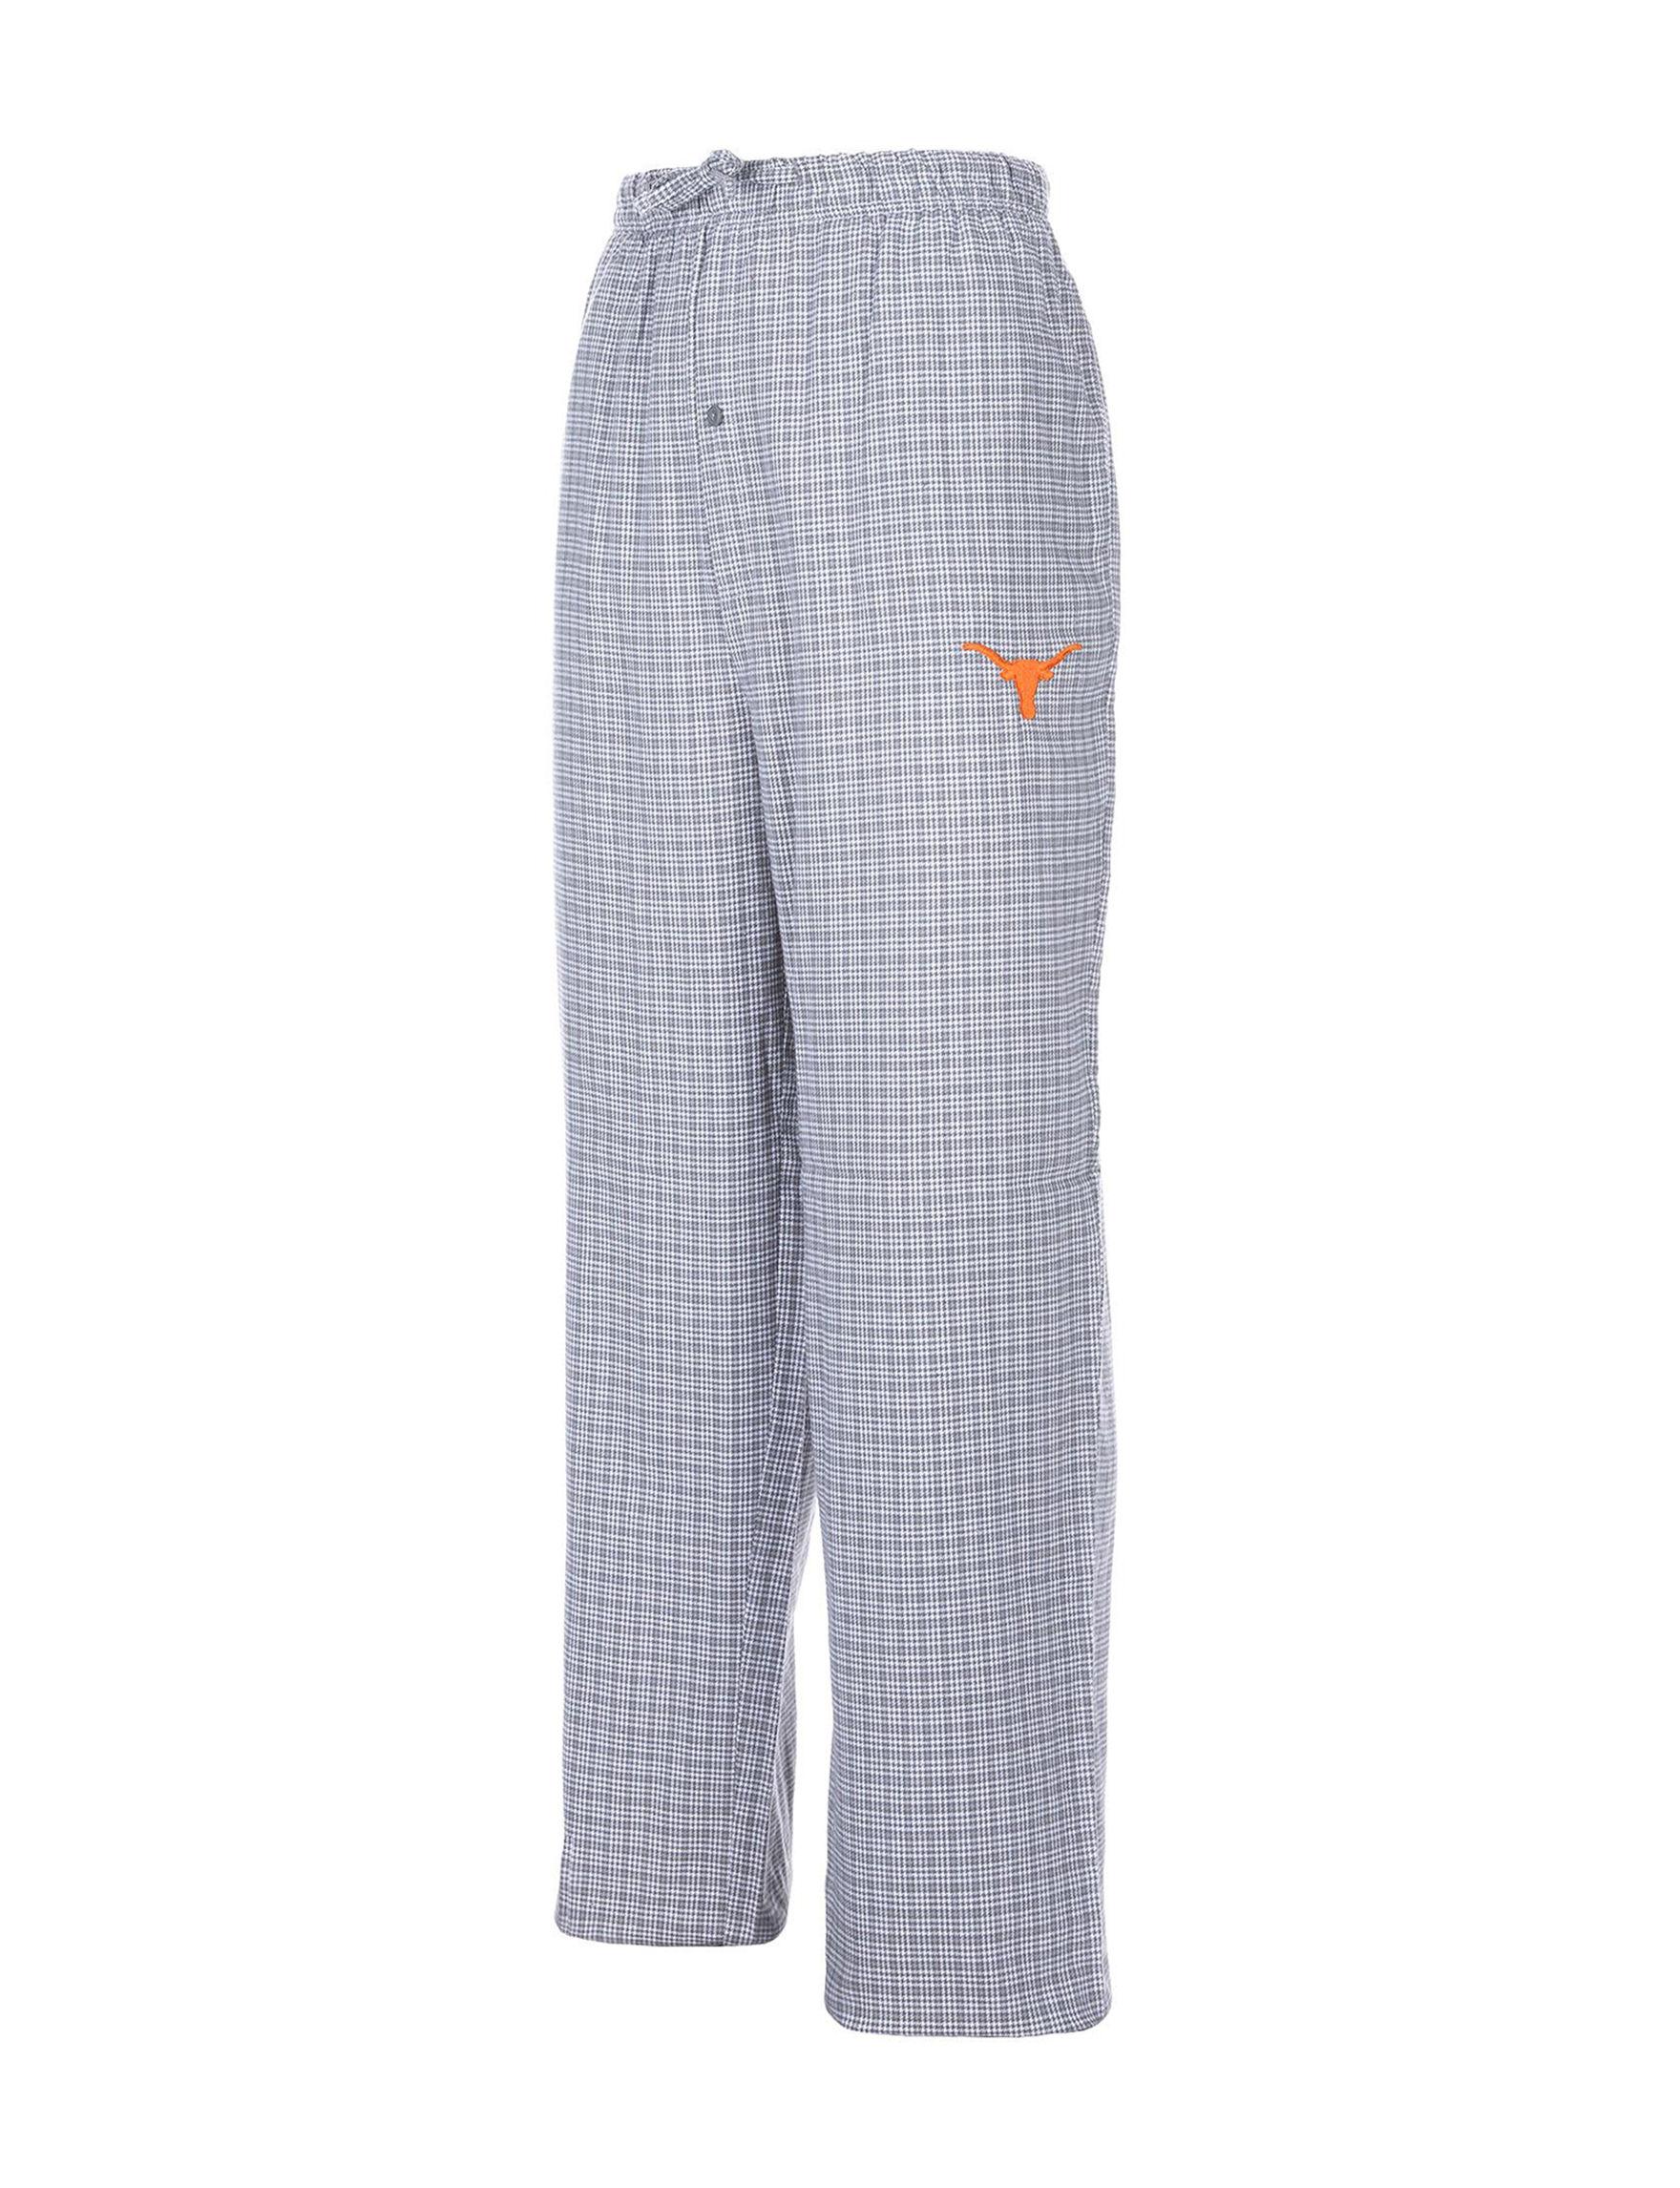 NCAA White / Black Pajama Bottoms